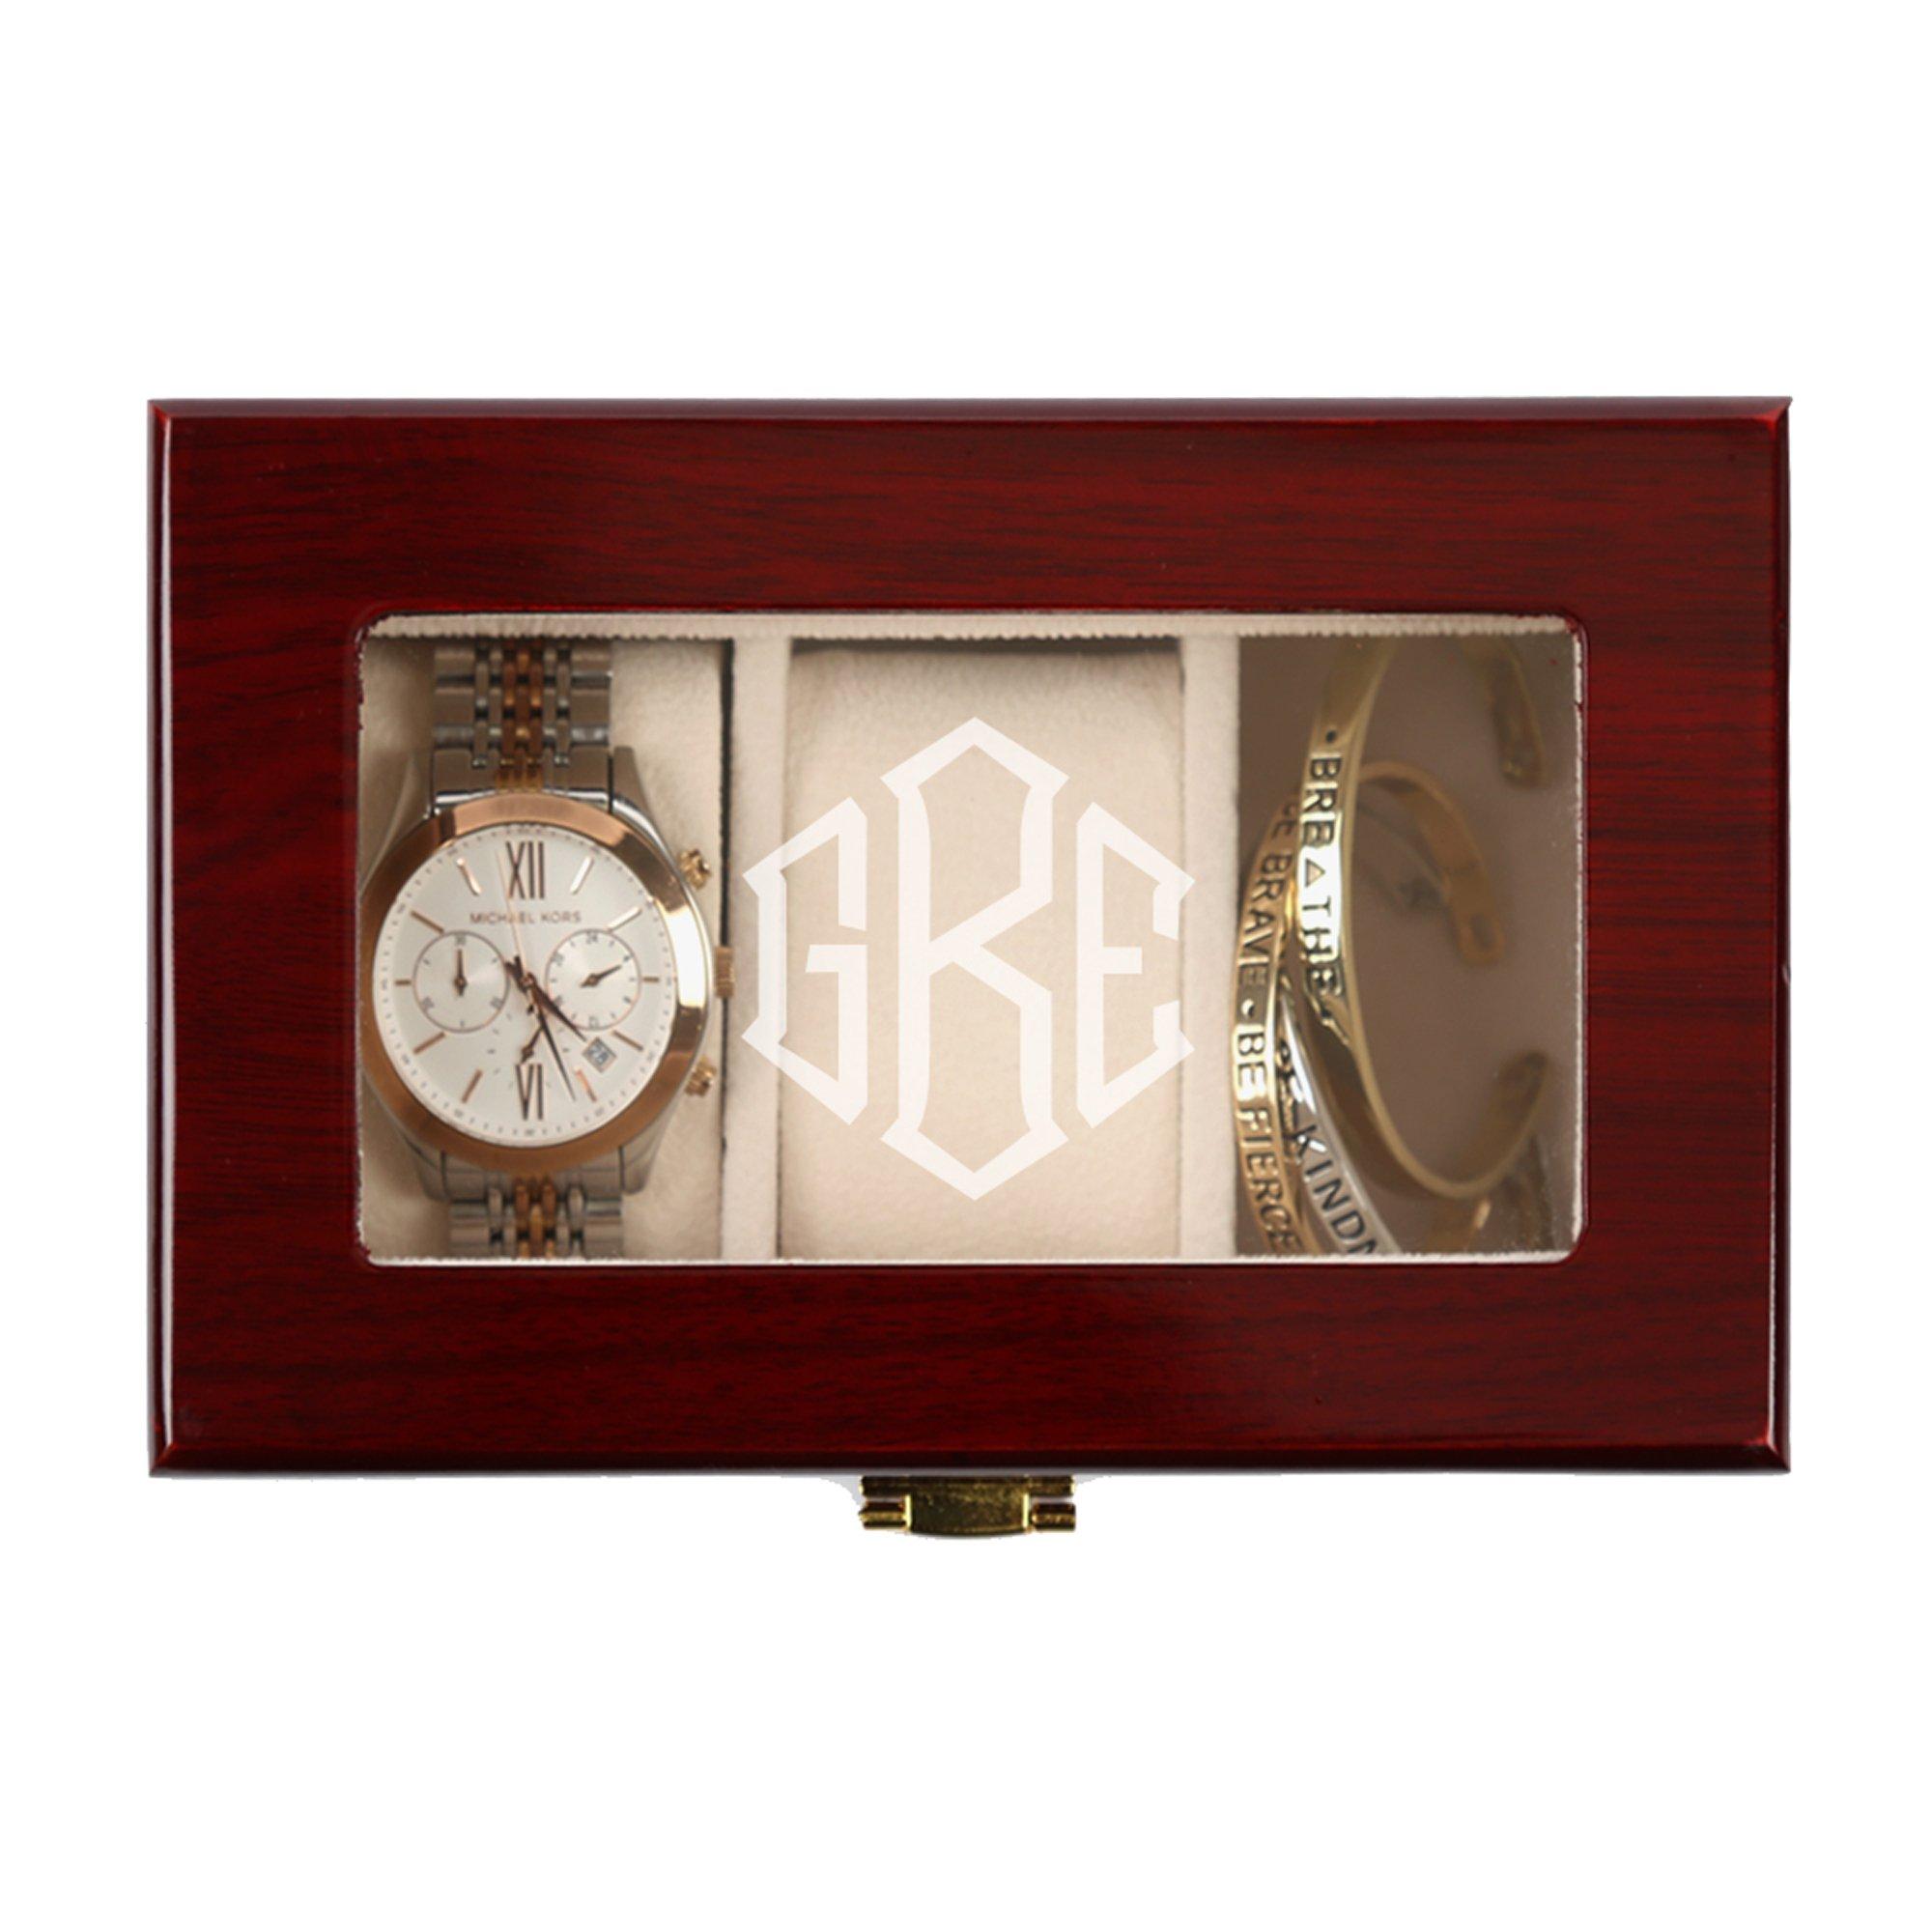 Monogram Professional 3 Slot Cherry Finish Wood Watch Organizer Case 6.25'' W. x 4.25'' H. x 3'' D